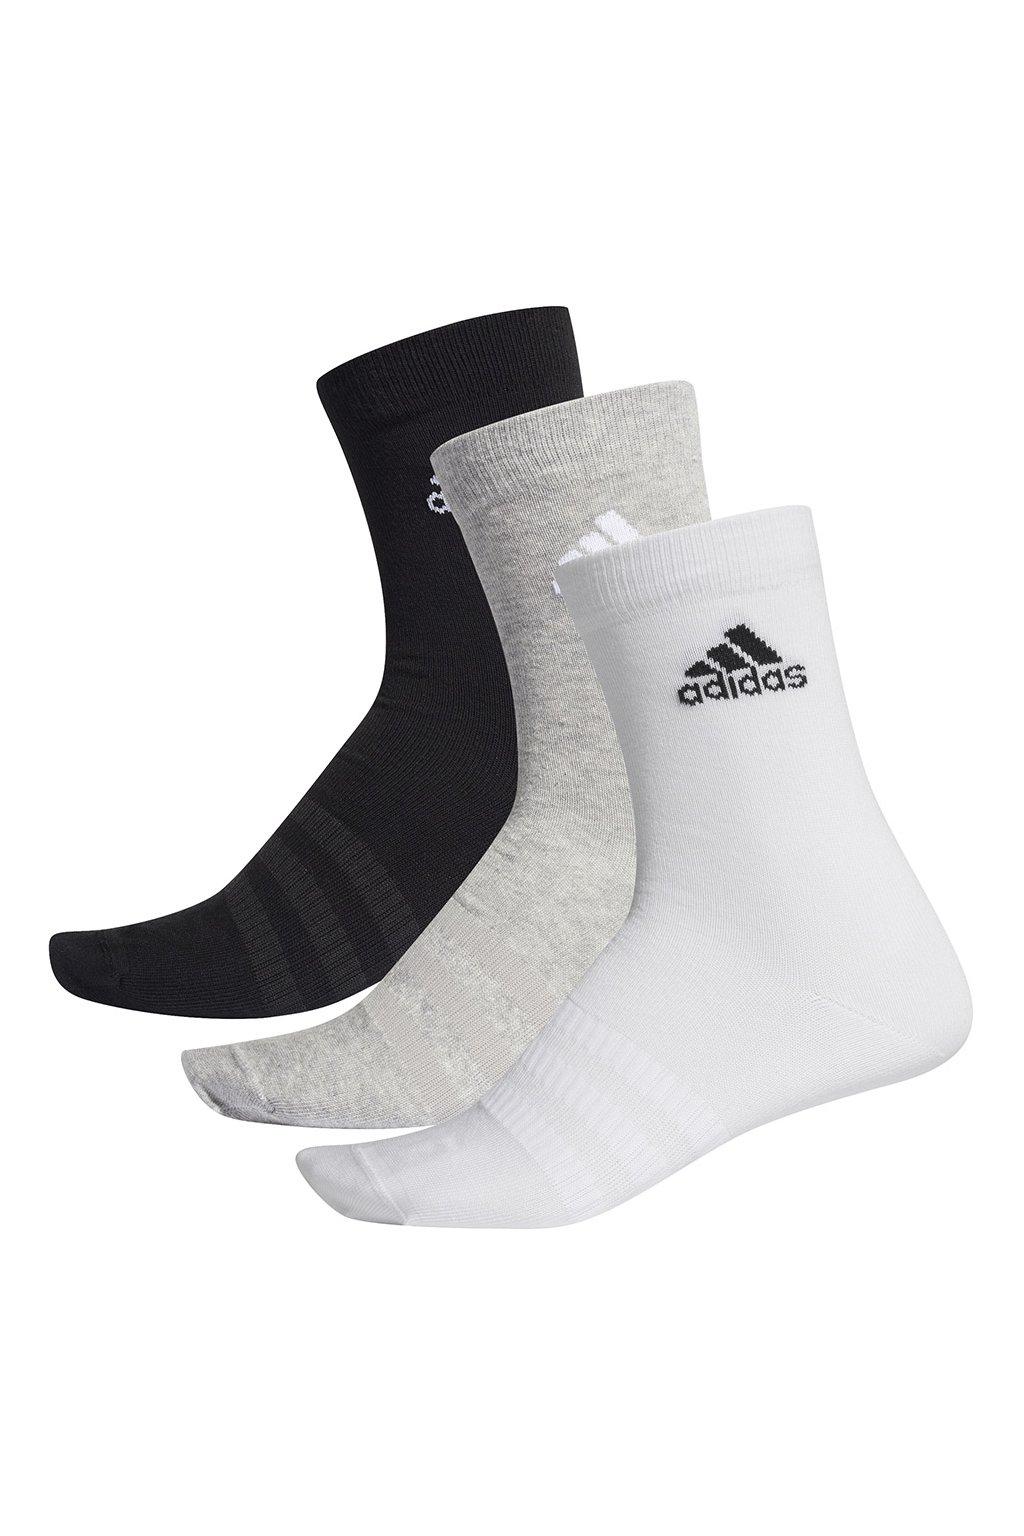 Ponožky Adidas Light Crew 3PP čierne, biele, sivé DZ9392